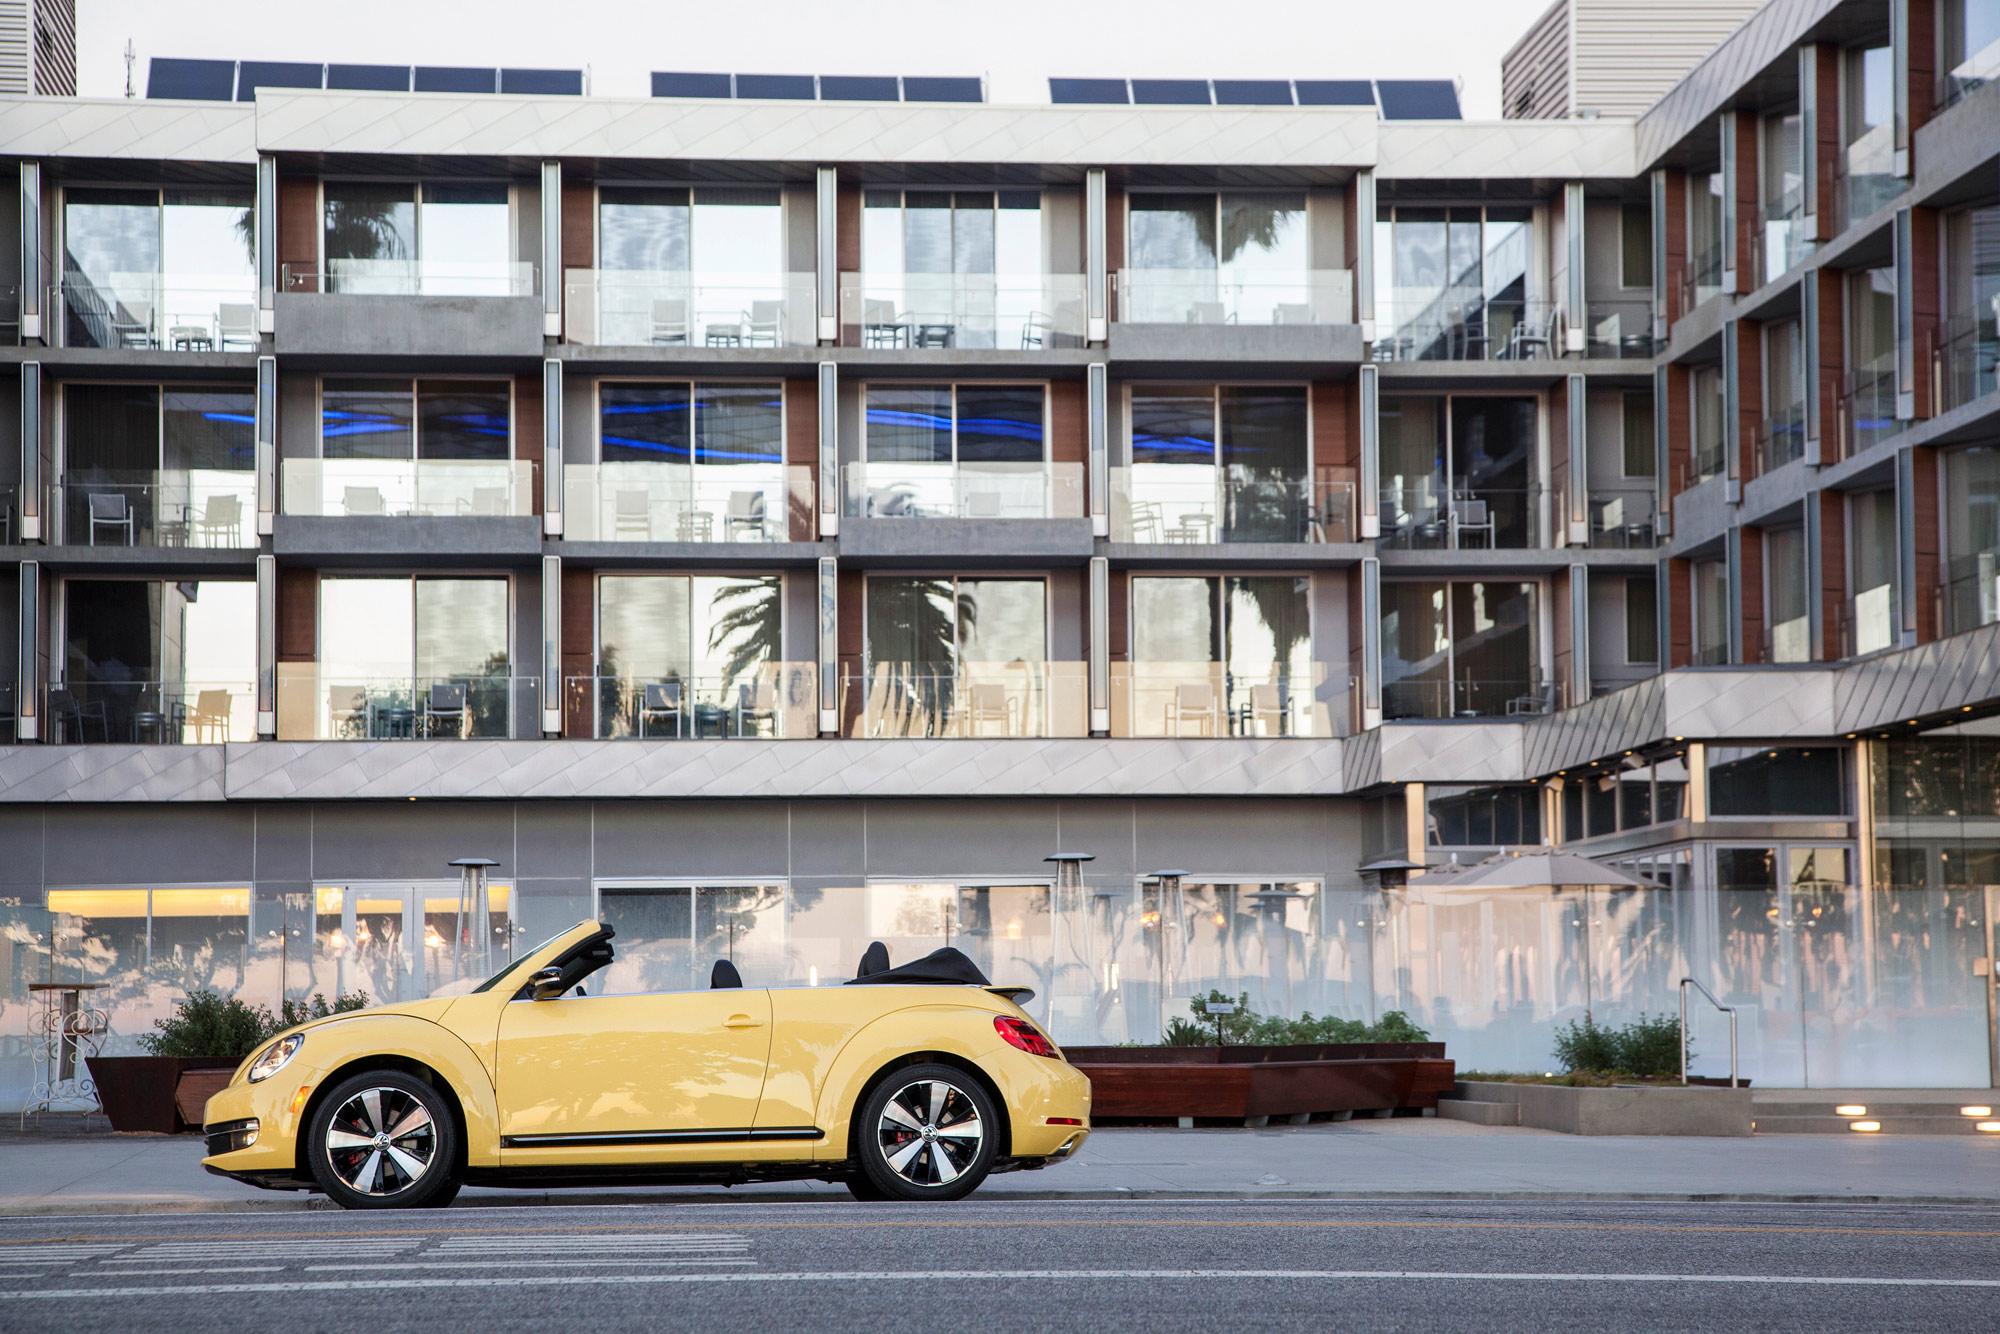 Find of the Day: Rare and Low Mileage 1991 Audi 200 Turbo quattro 20 ...